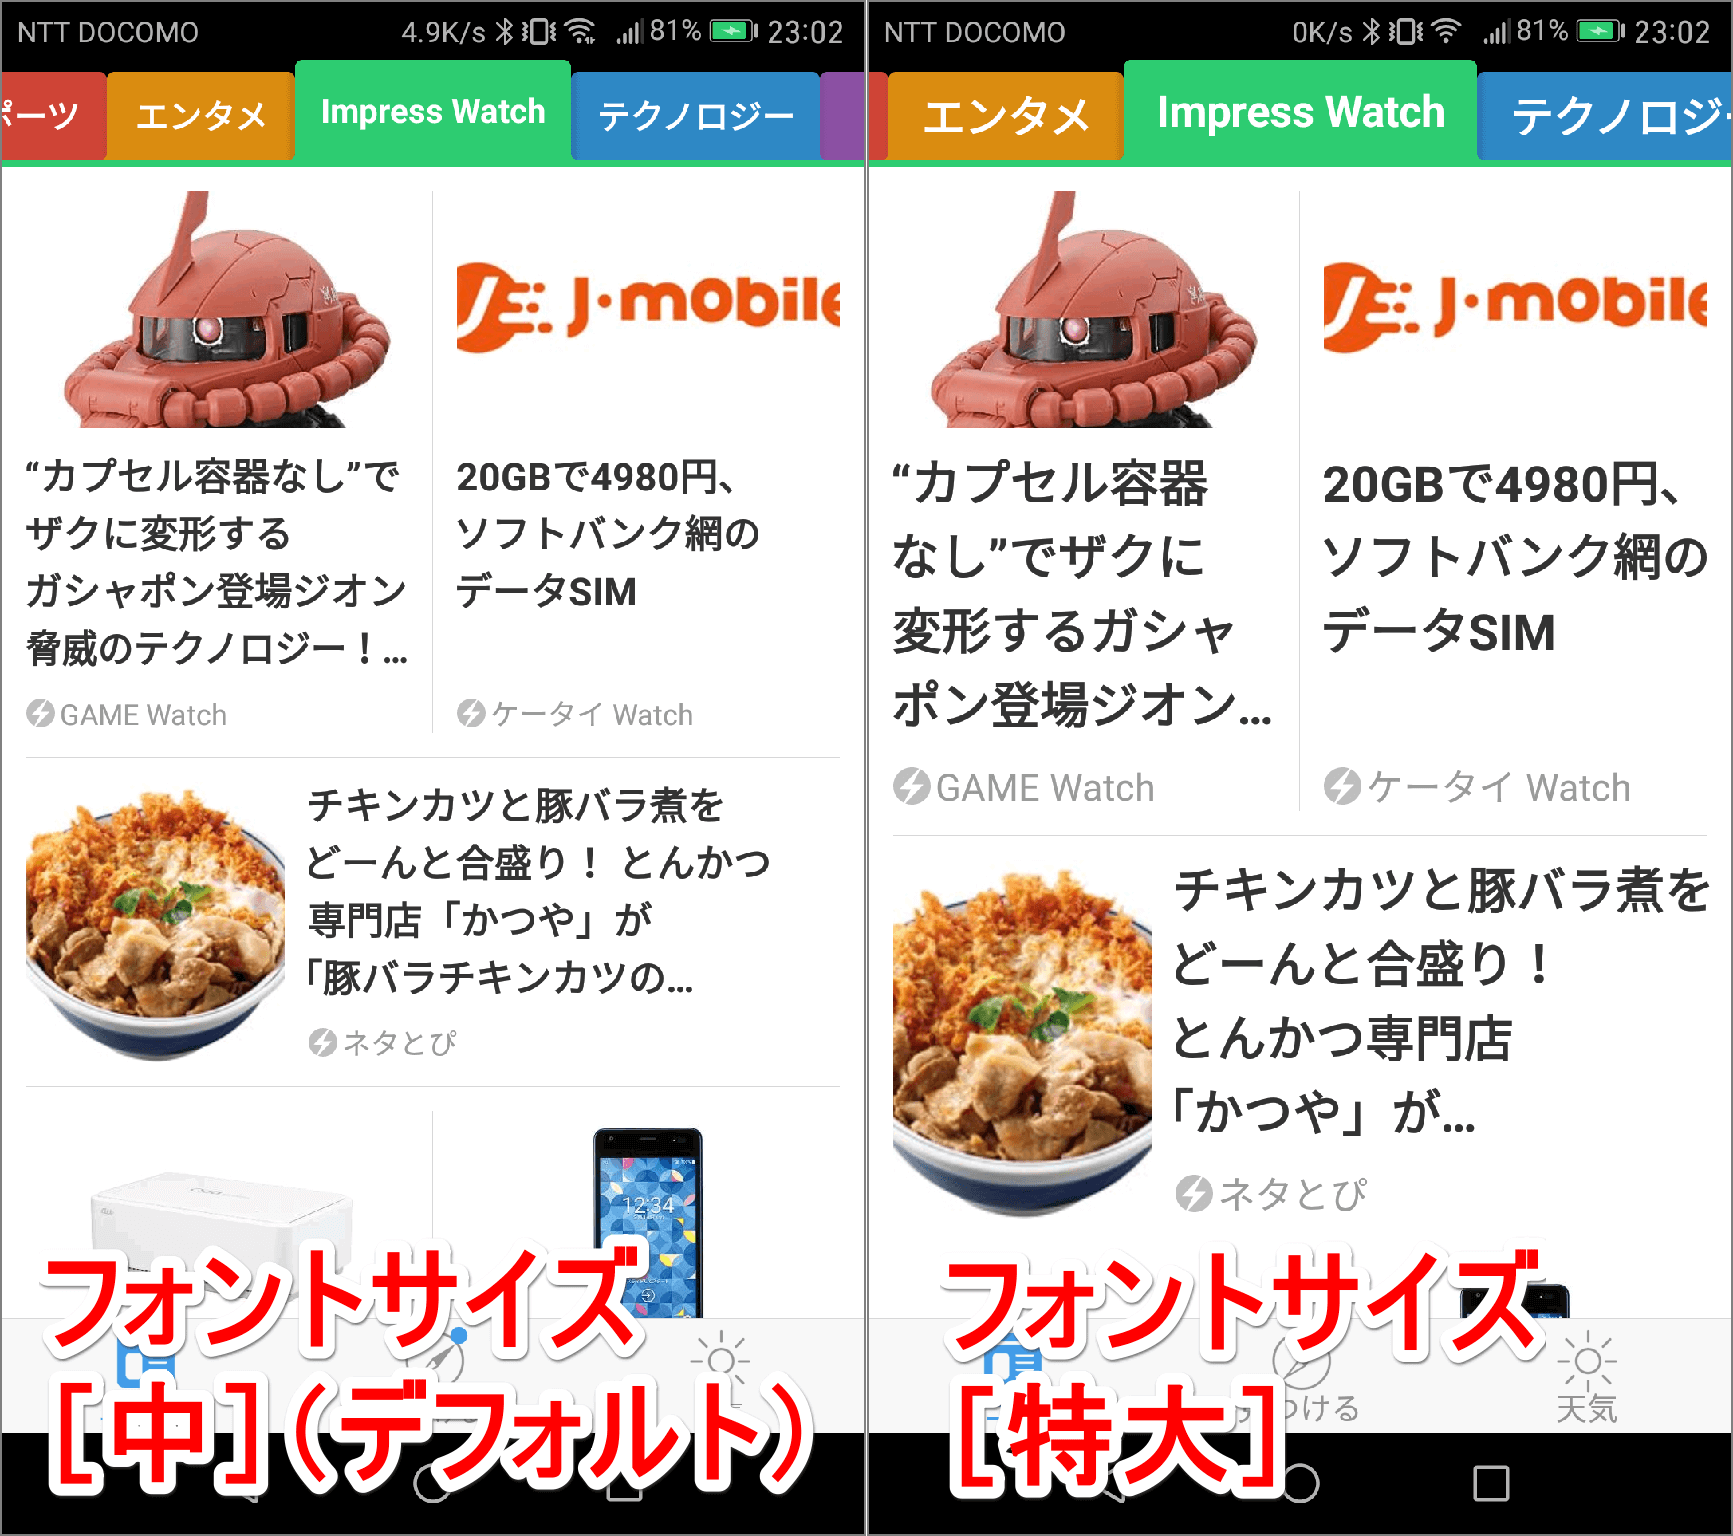 Androidの文字サイズ変更の前後比較その1